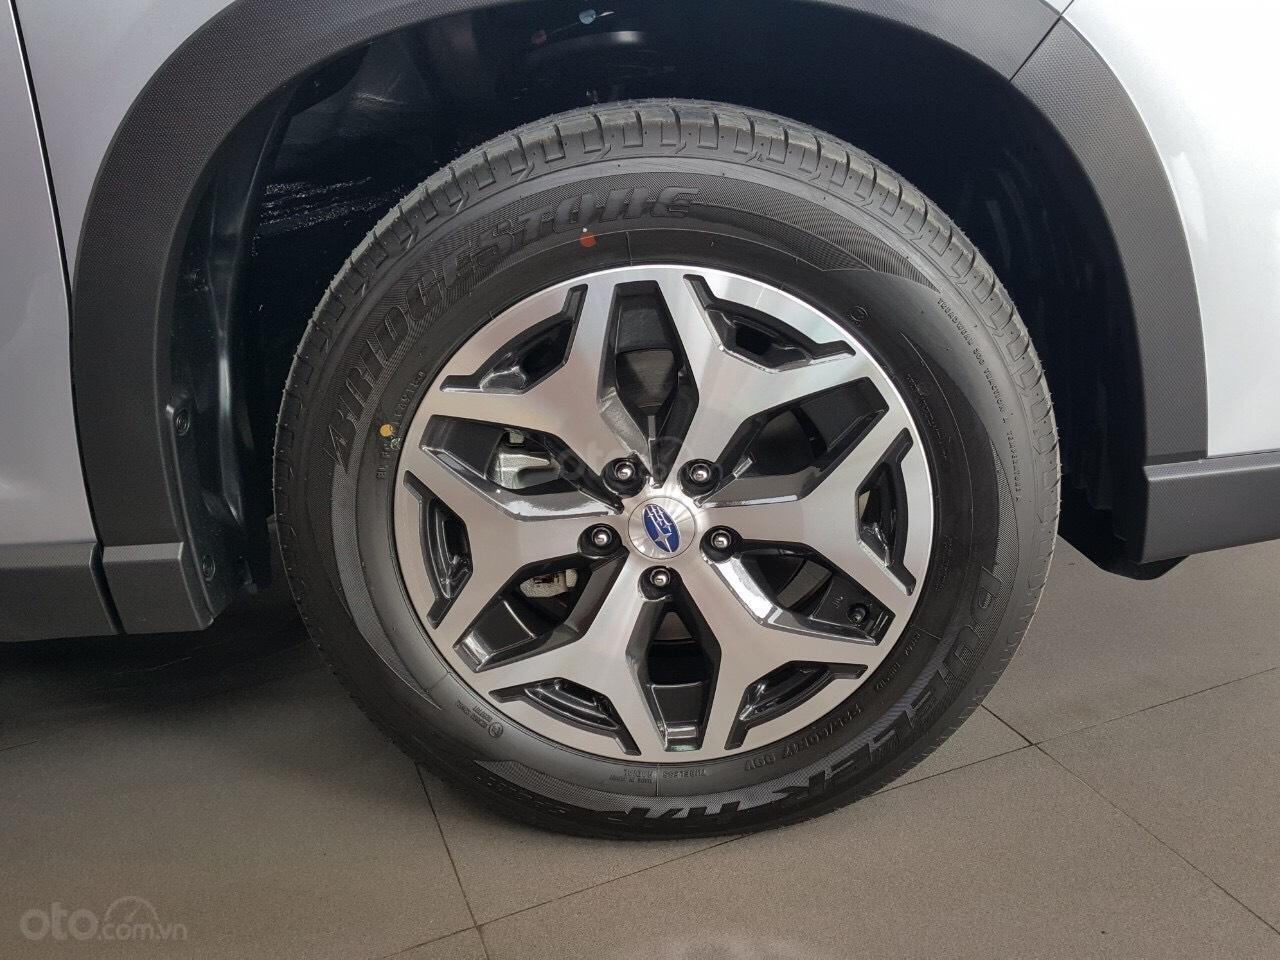 Bán Subaru Forester 2.0 IL, giảm TM trên 100tr, gọi 093.22222.30 Ms Loan (8)